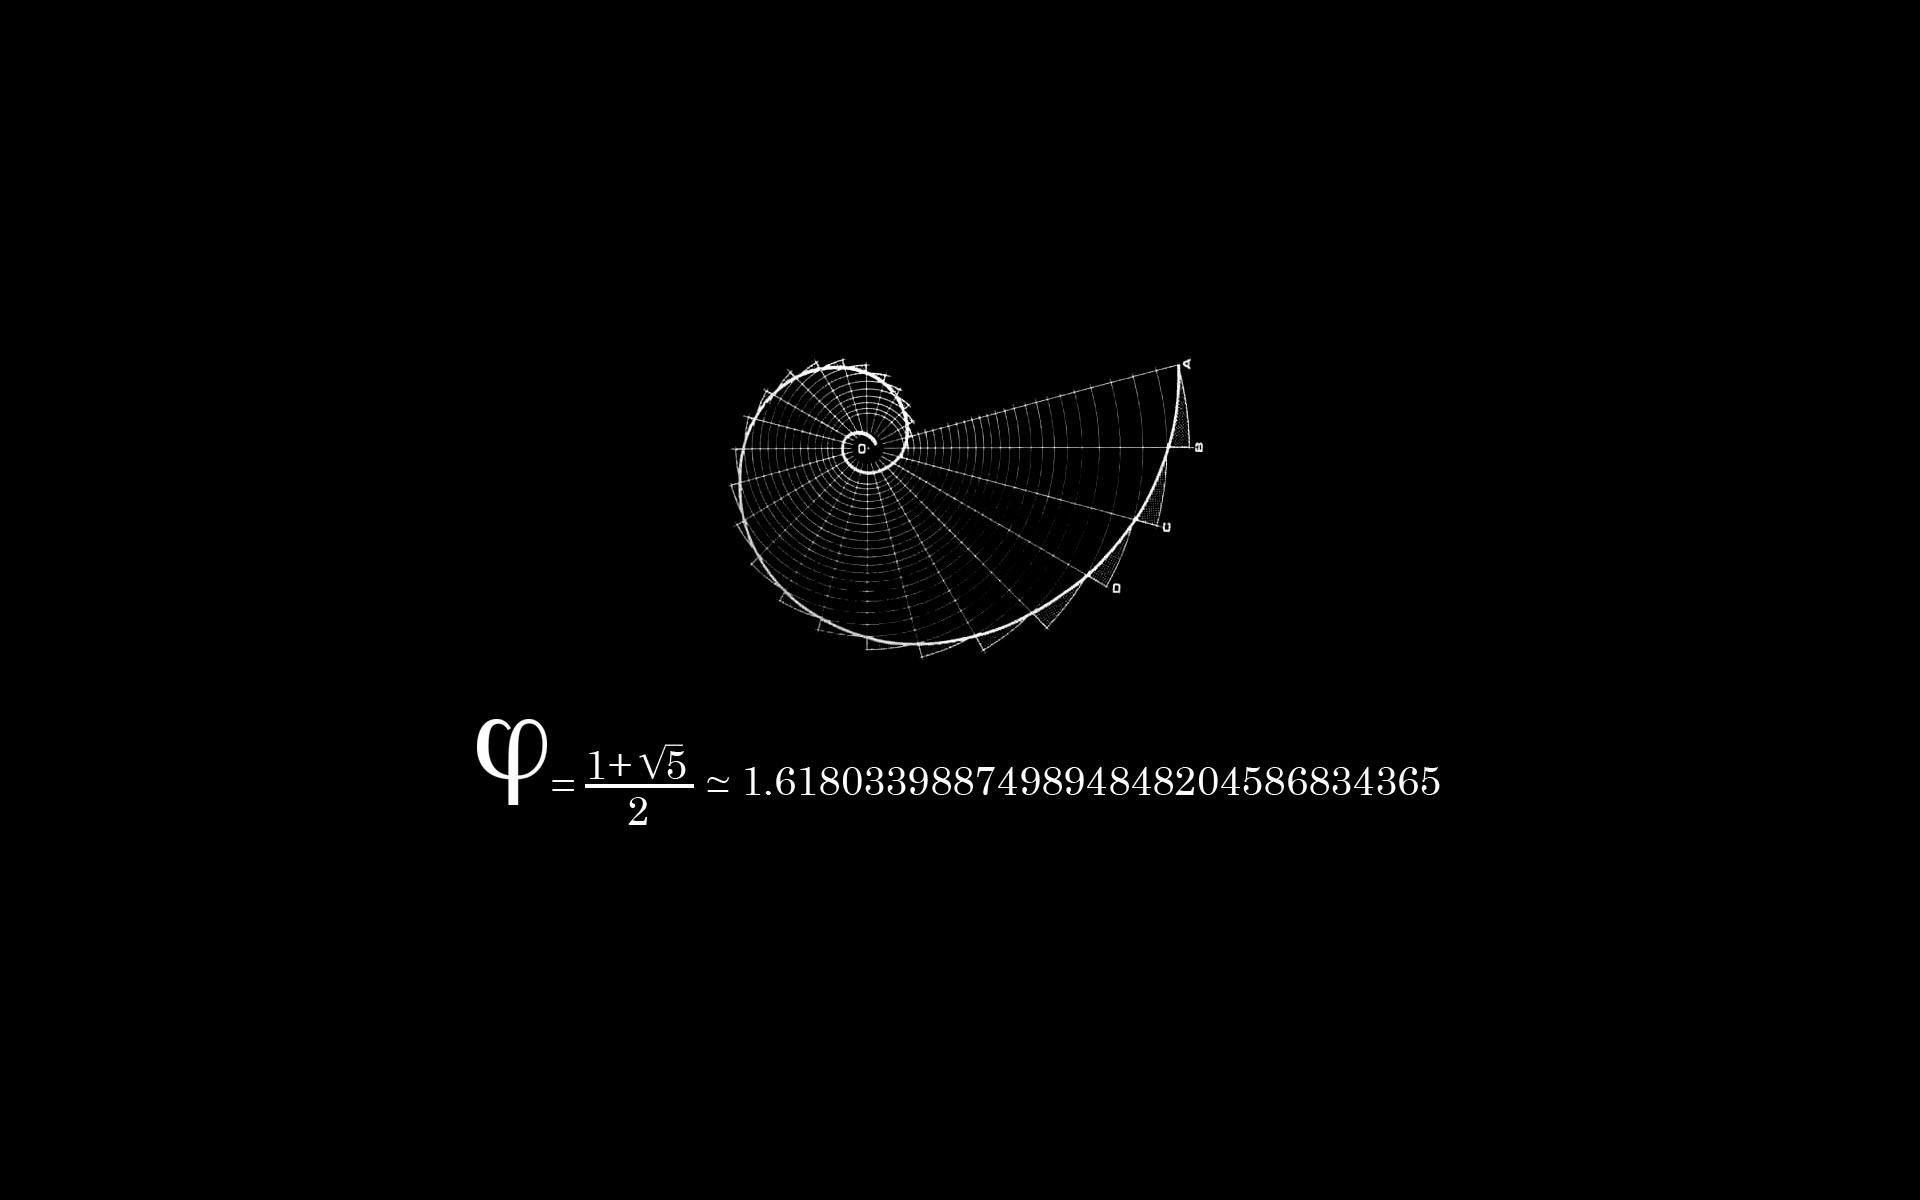 Fibonacci Sequence, Fibonacci Number, Fibonacci Spiral, Golden Ratio, Sacred  Geometry, God's